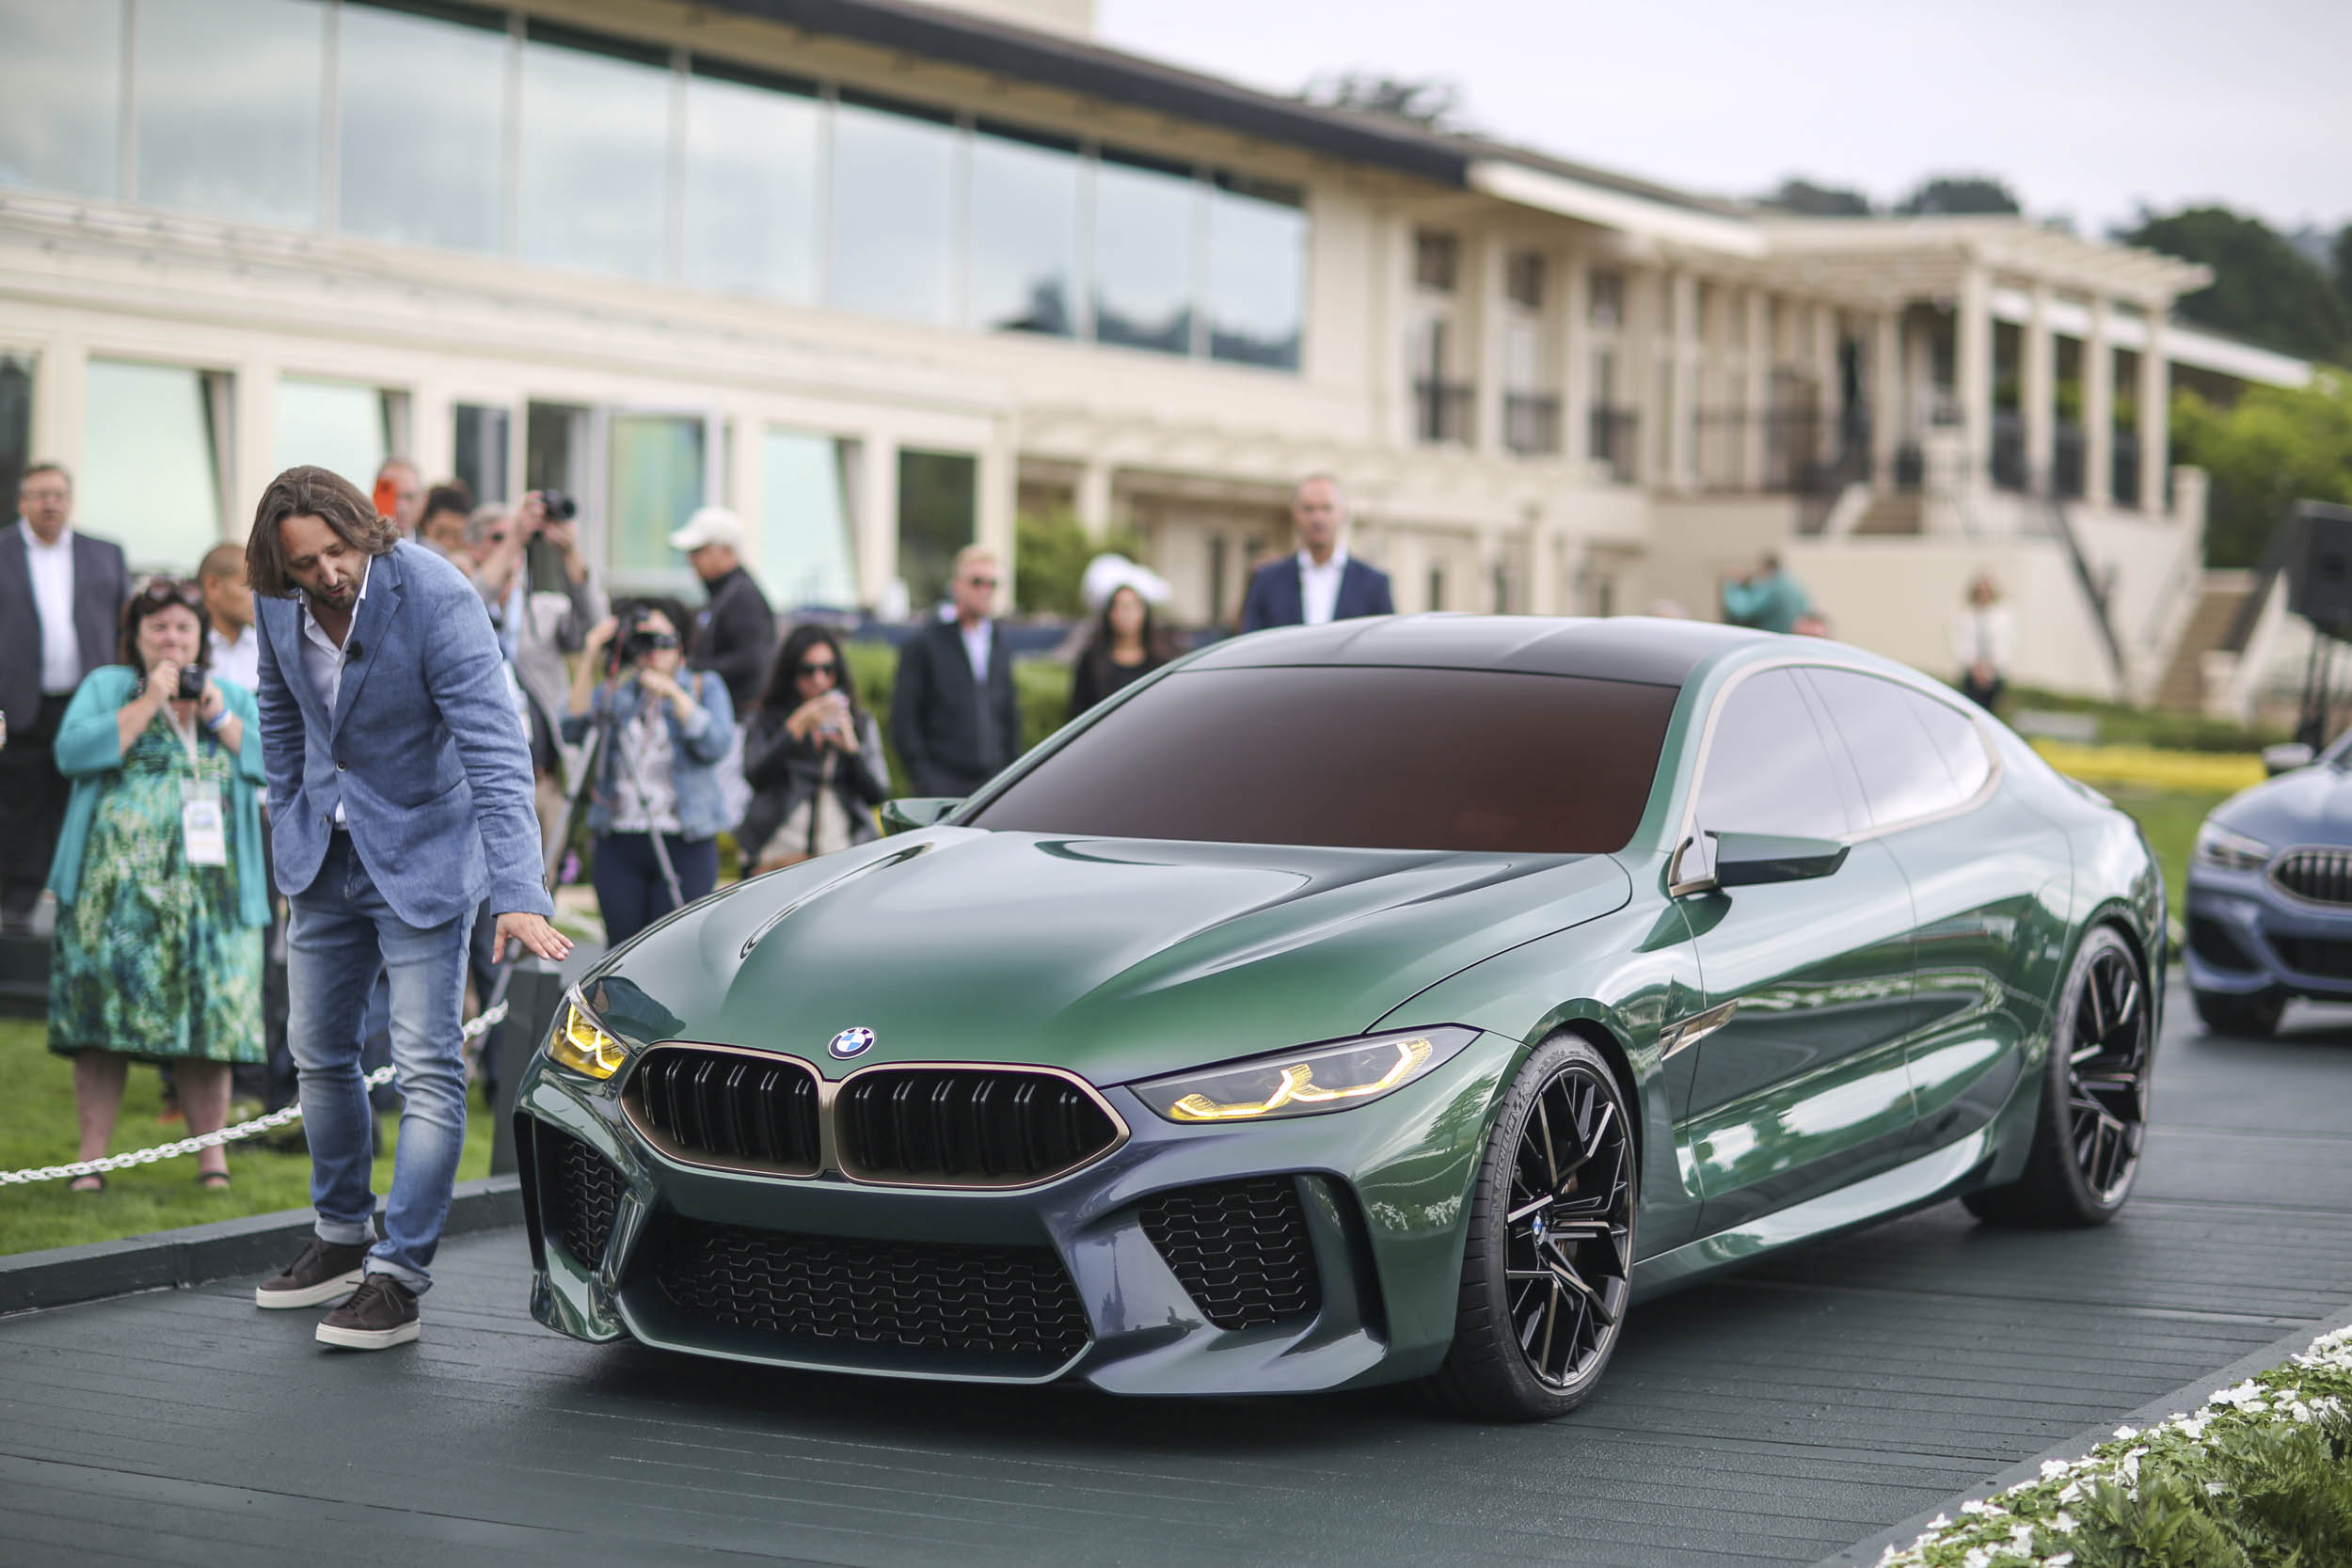 BMW M8 Gran Coupe unveil